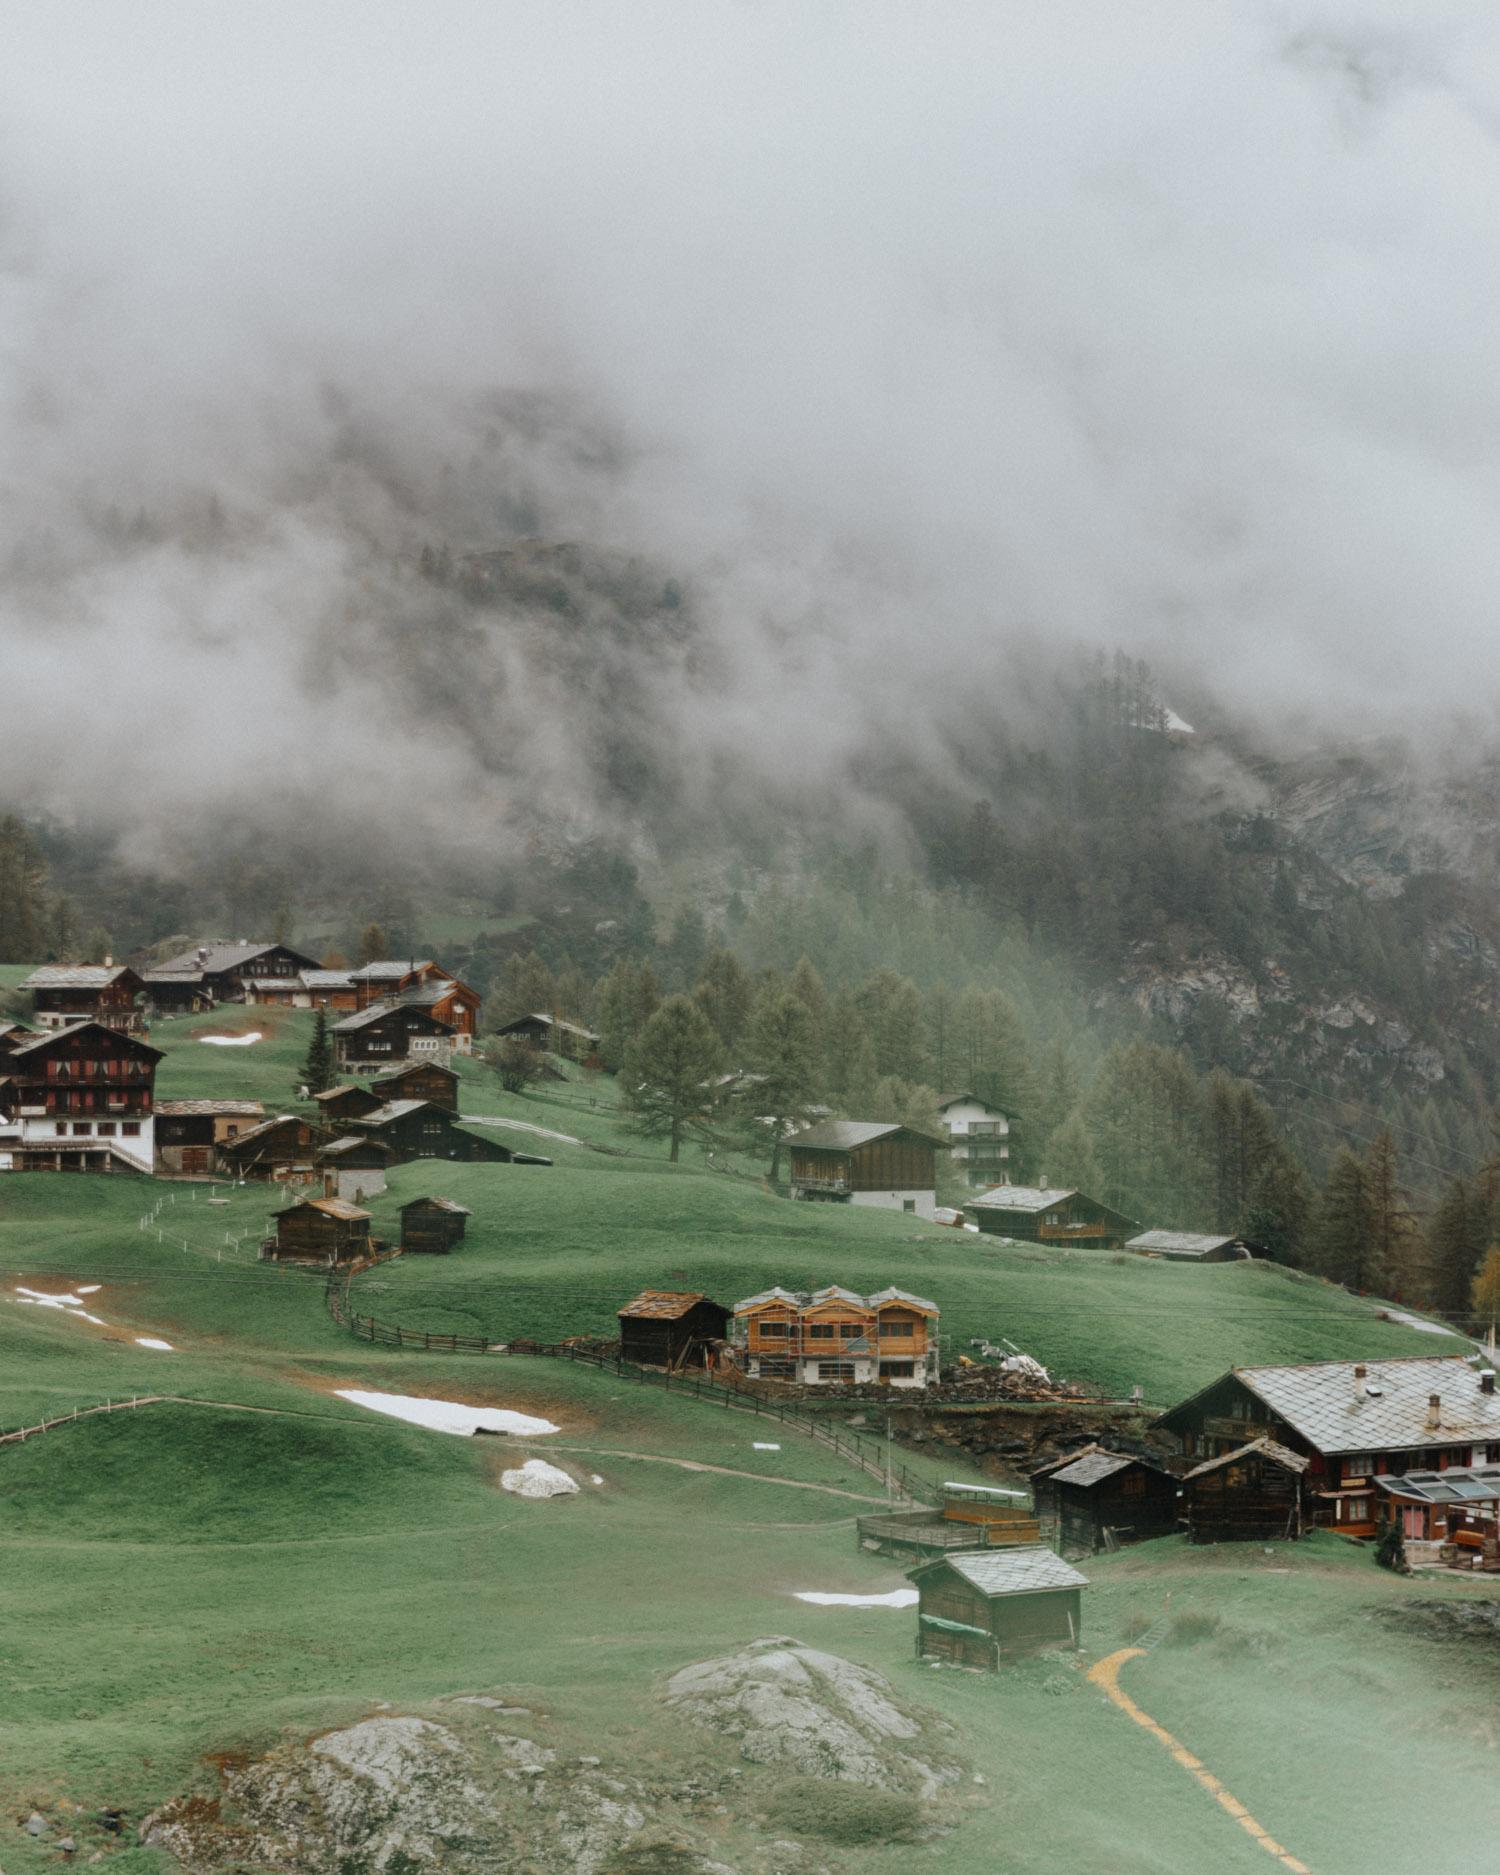 Byn Zermatt bland molnen i Schweiziska alperna